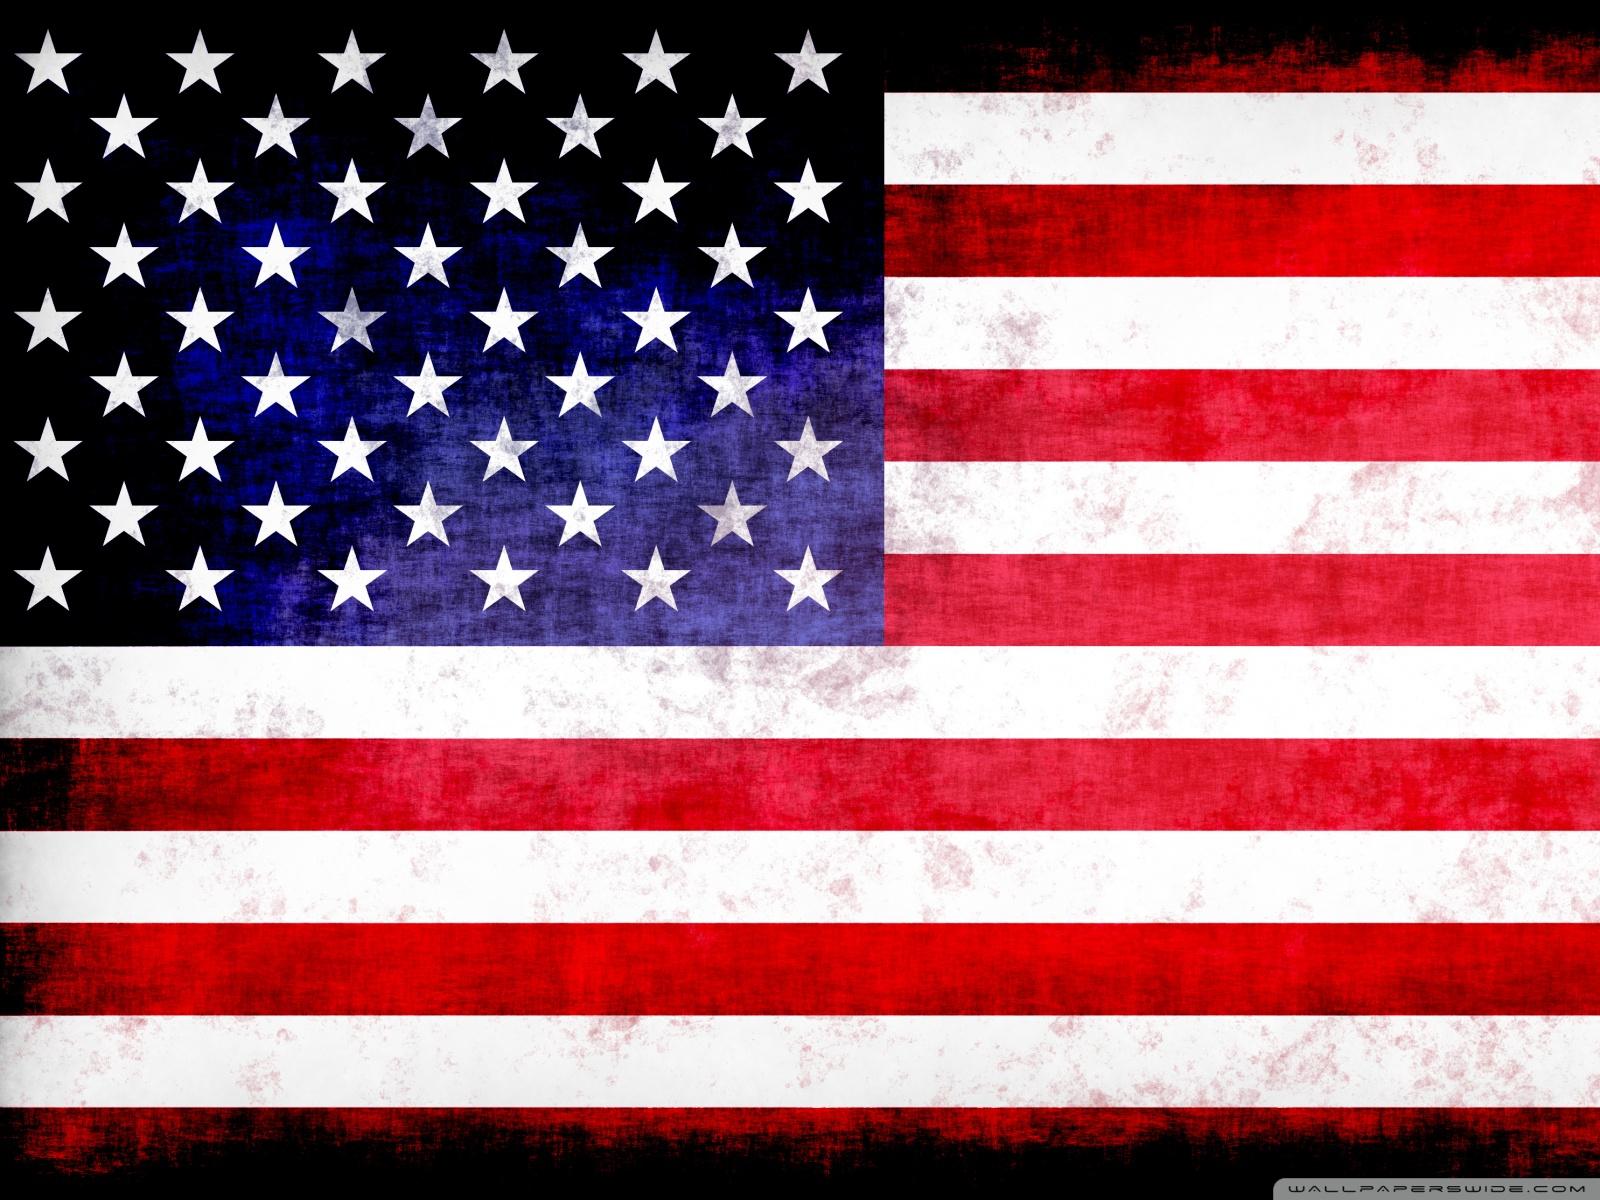 Free Grunge USA Flag phone wallpaper by msevil